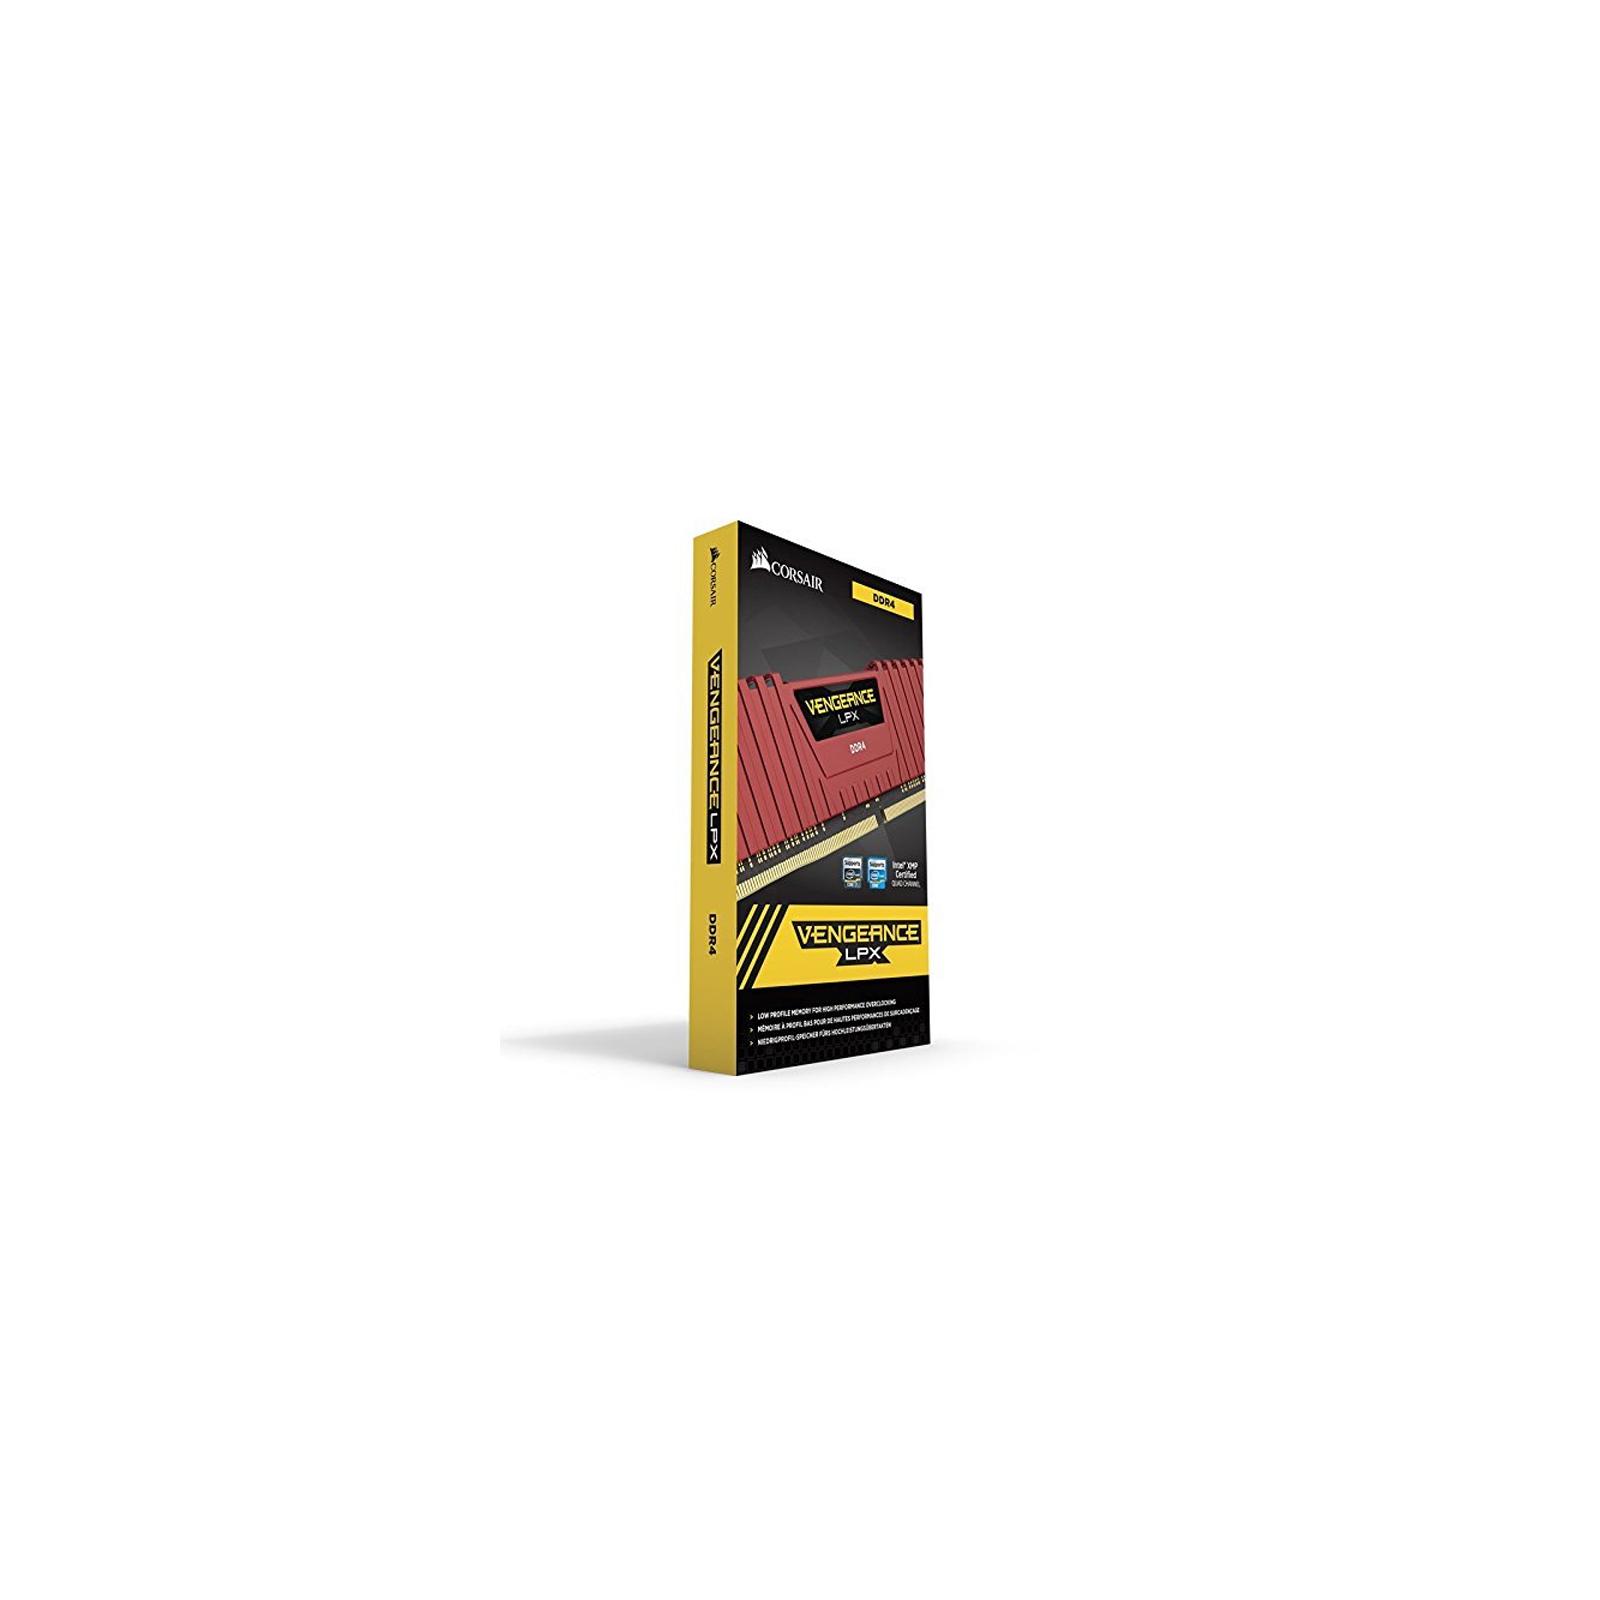 Модуль памяти для компьютера DDR4 16GB (2x8GB) 3000 MHz Vengeance LPX Red CORSAIR (CMK16GX4M2B3000C15R) изображение 4